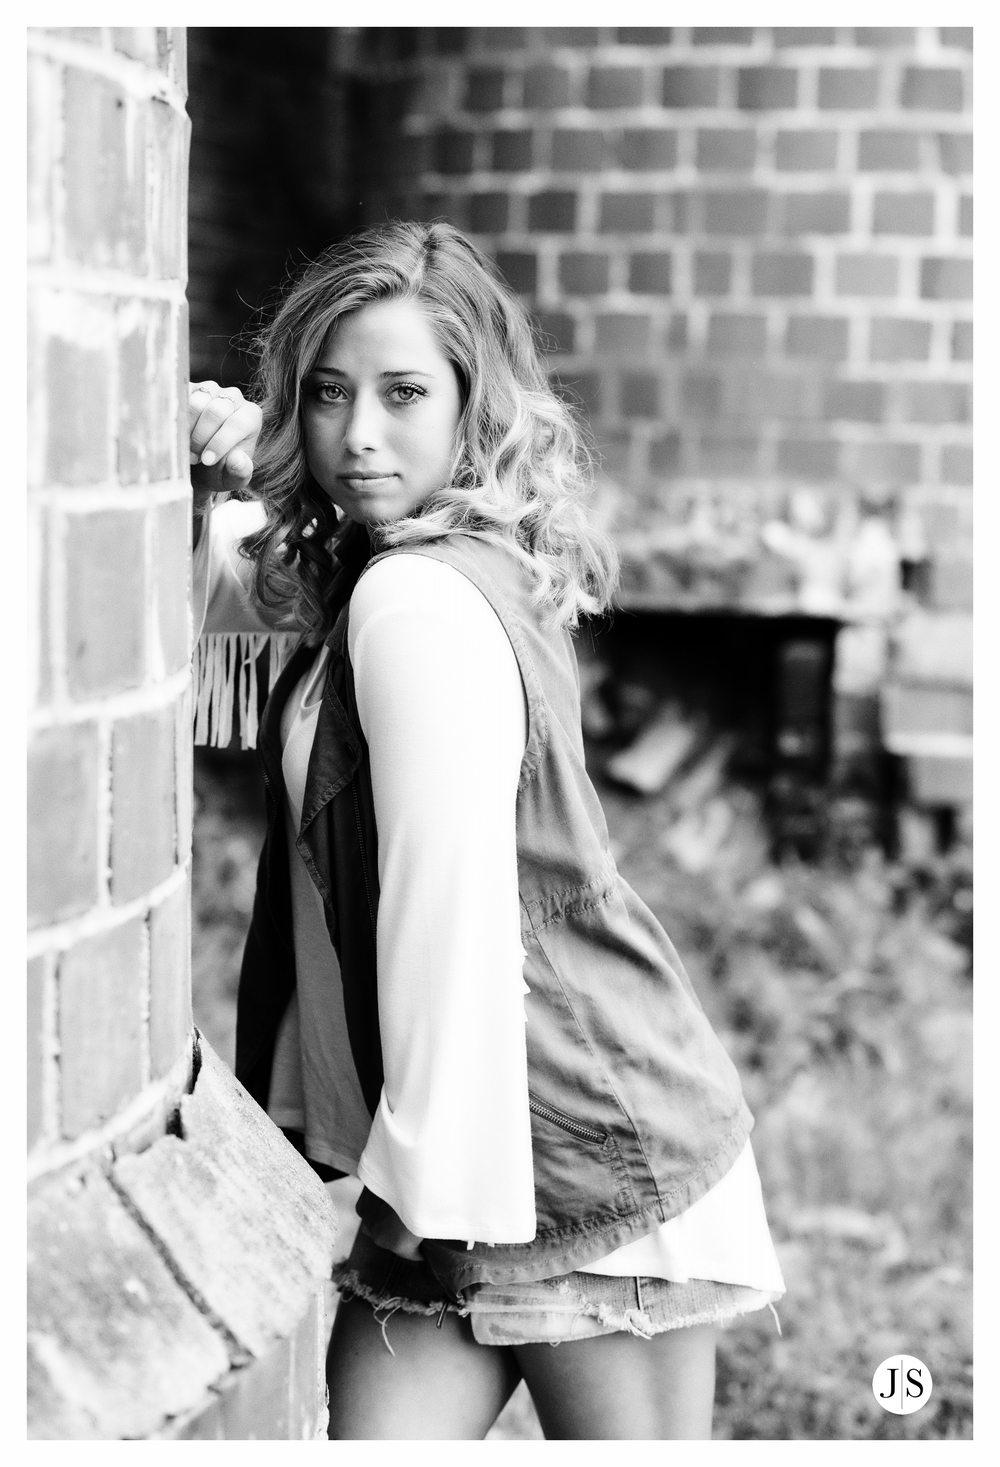 Kayla wells blog collage 5.jpg